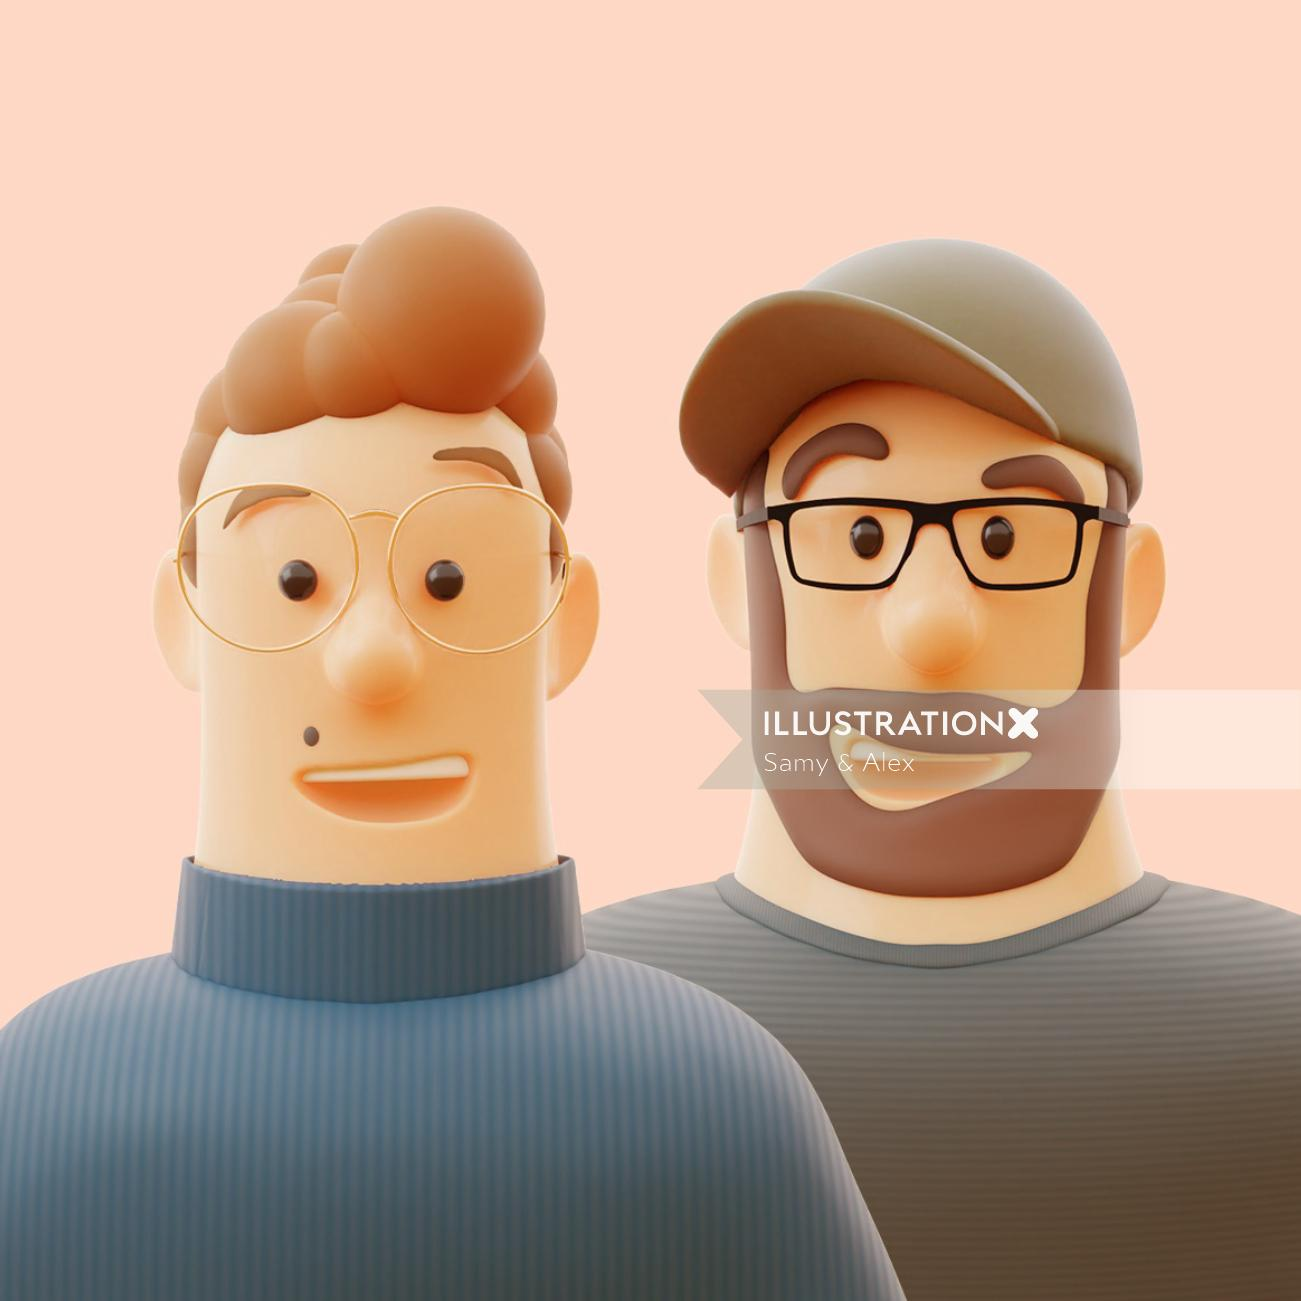 3d portrait illustration of Samy & Alex